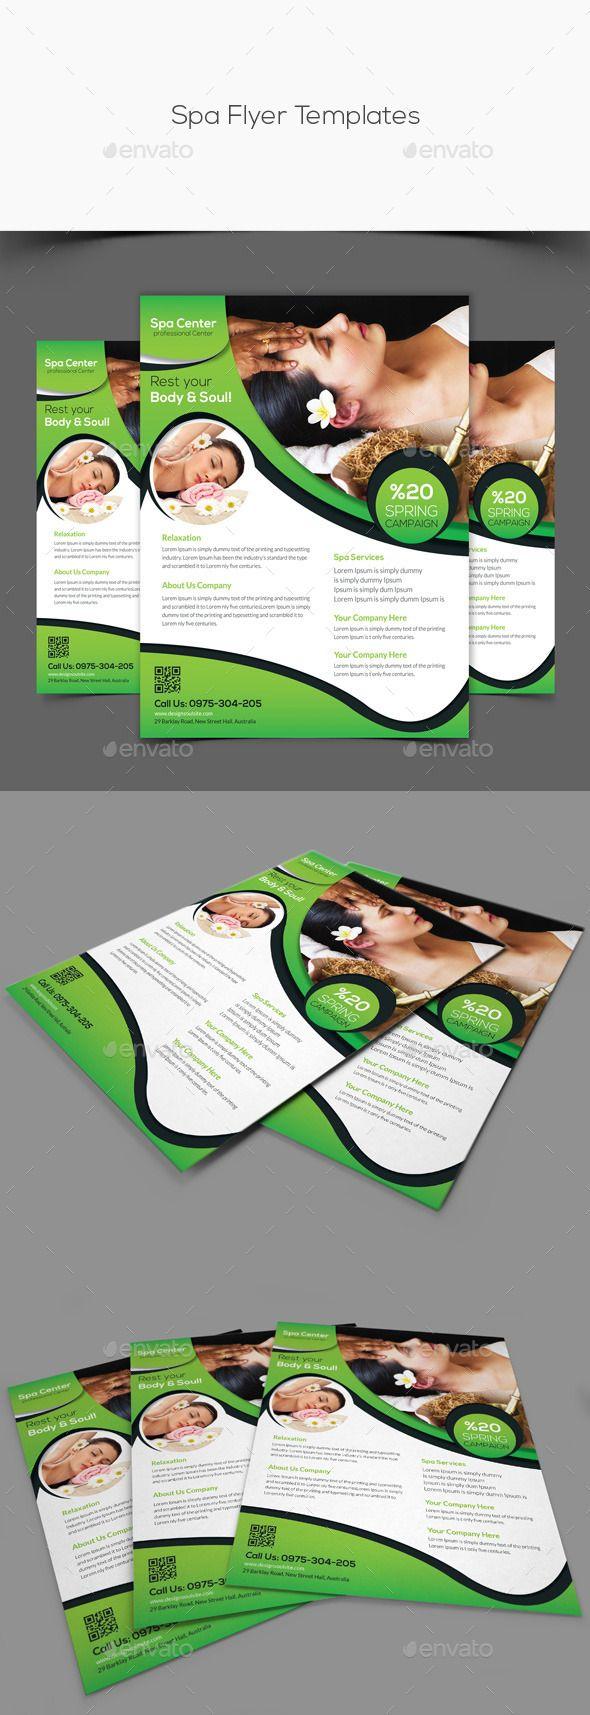 Best Spa Brochure Images On   Spa Brochure Brochures